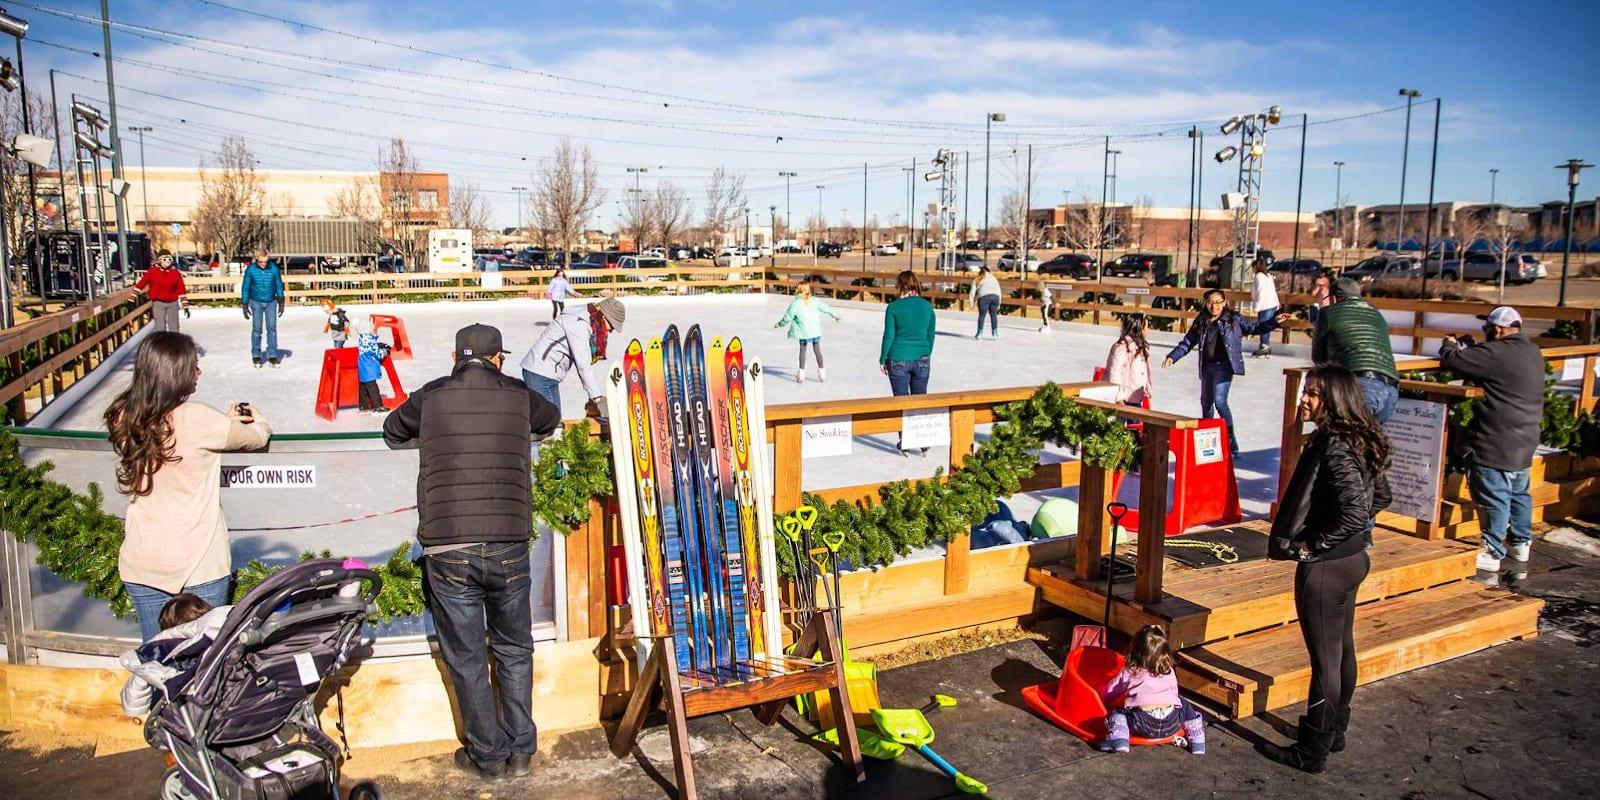 WinterSkate at Northfield in Denver, CO